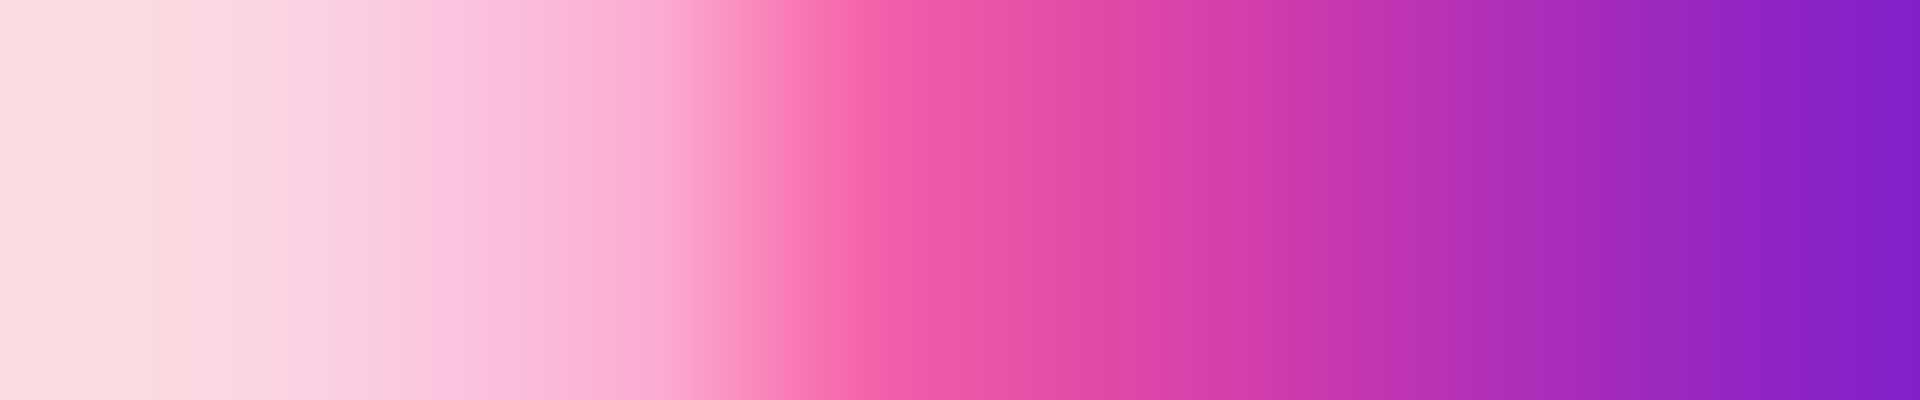 rot, rosa, pink, lila